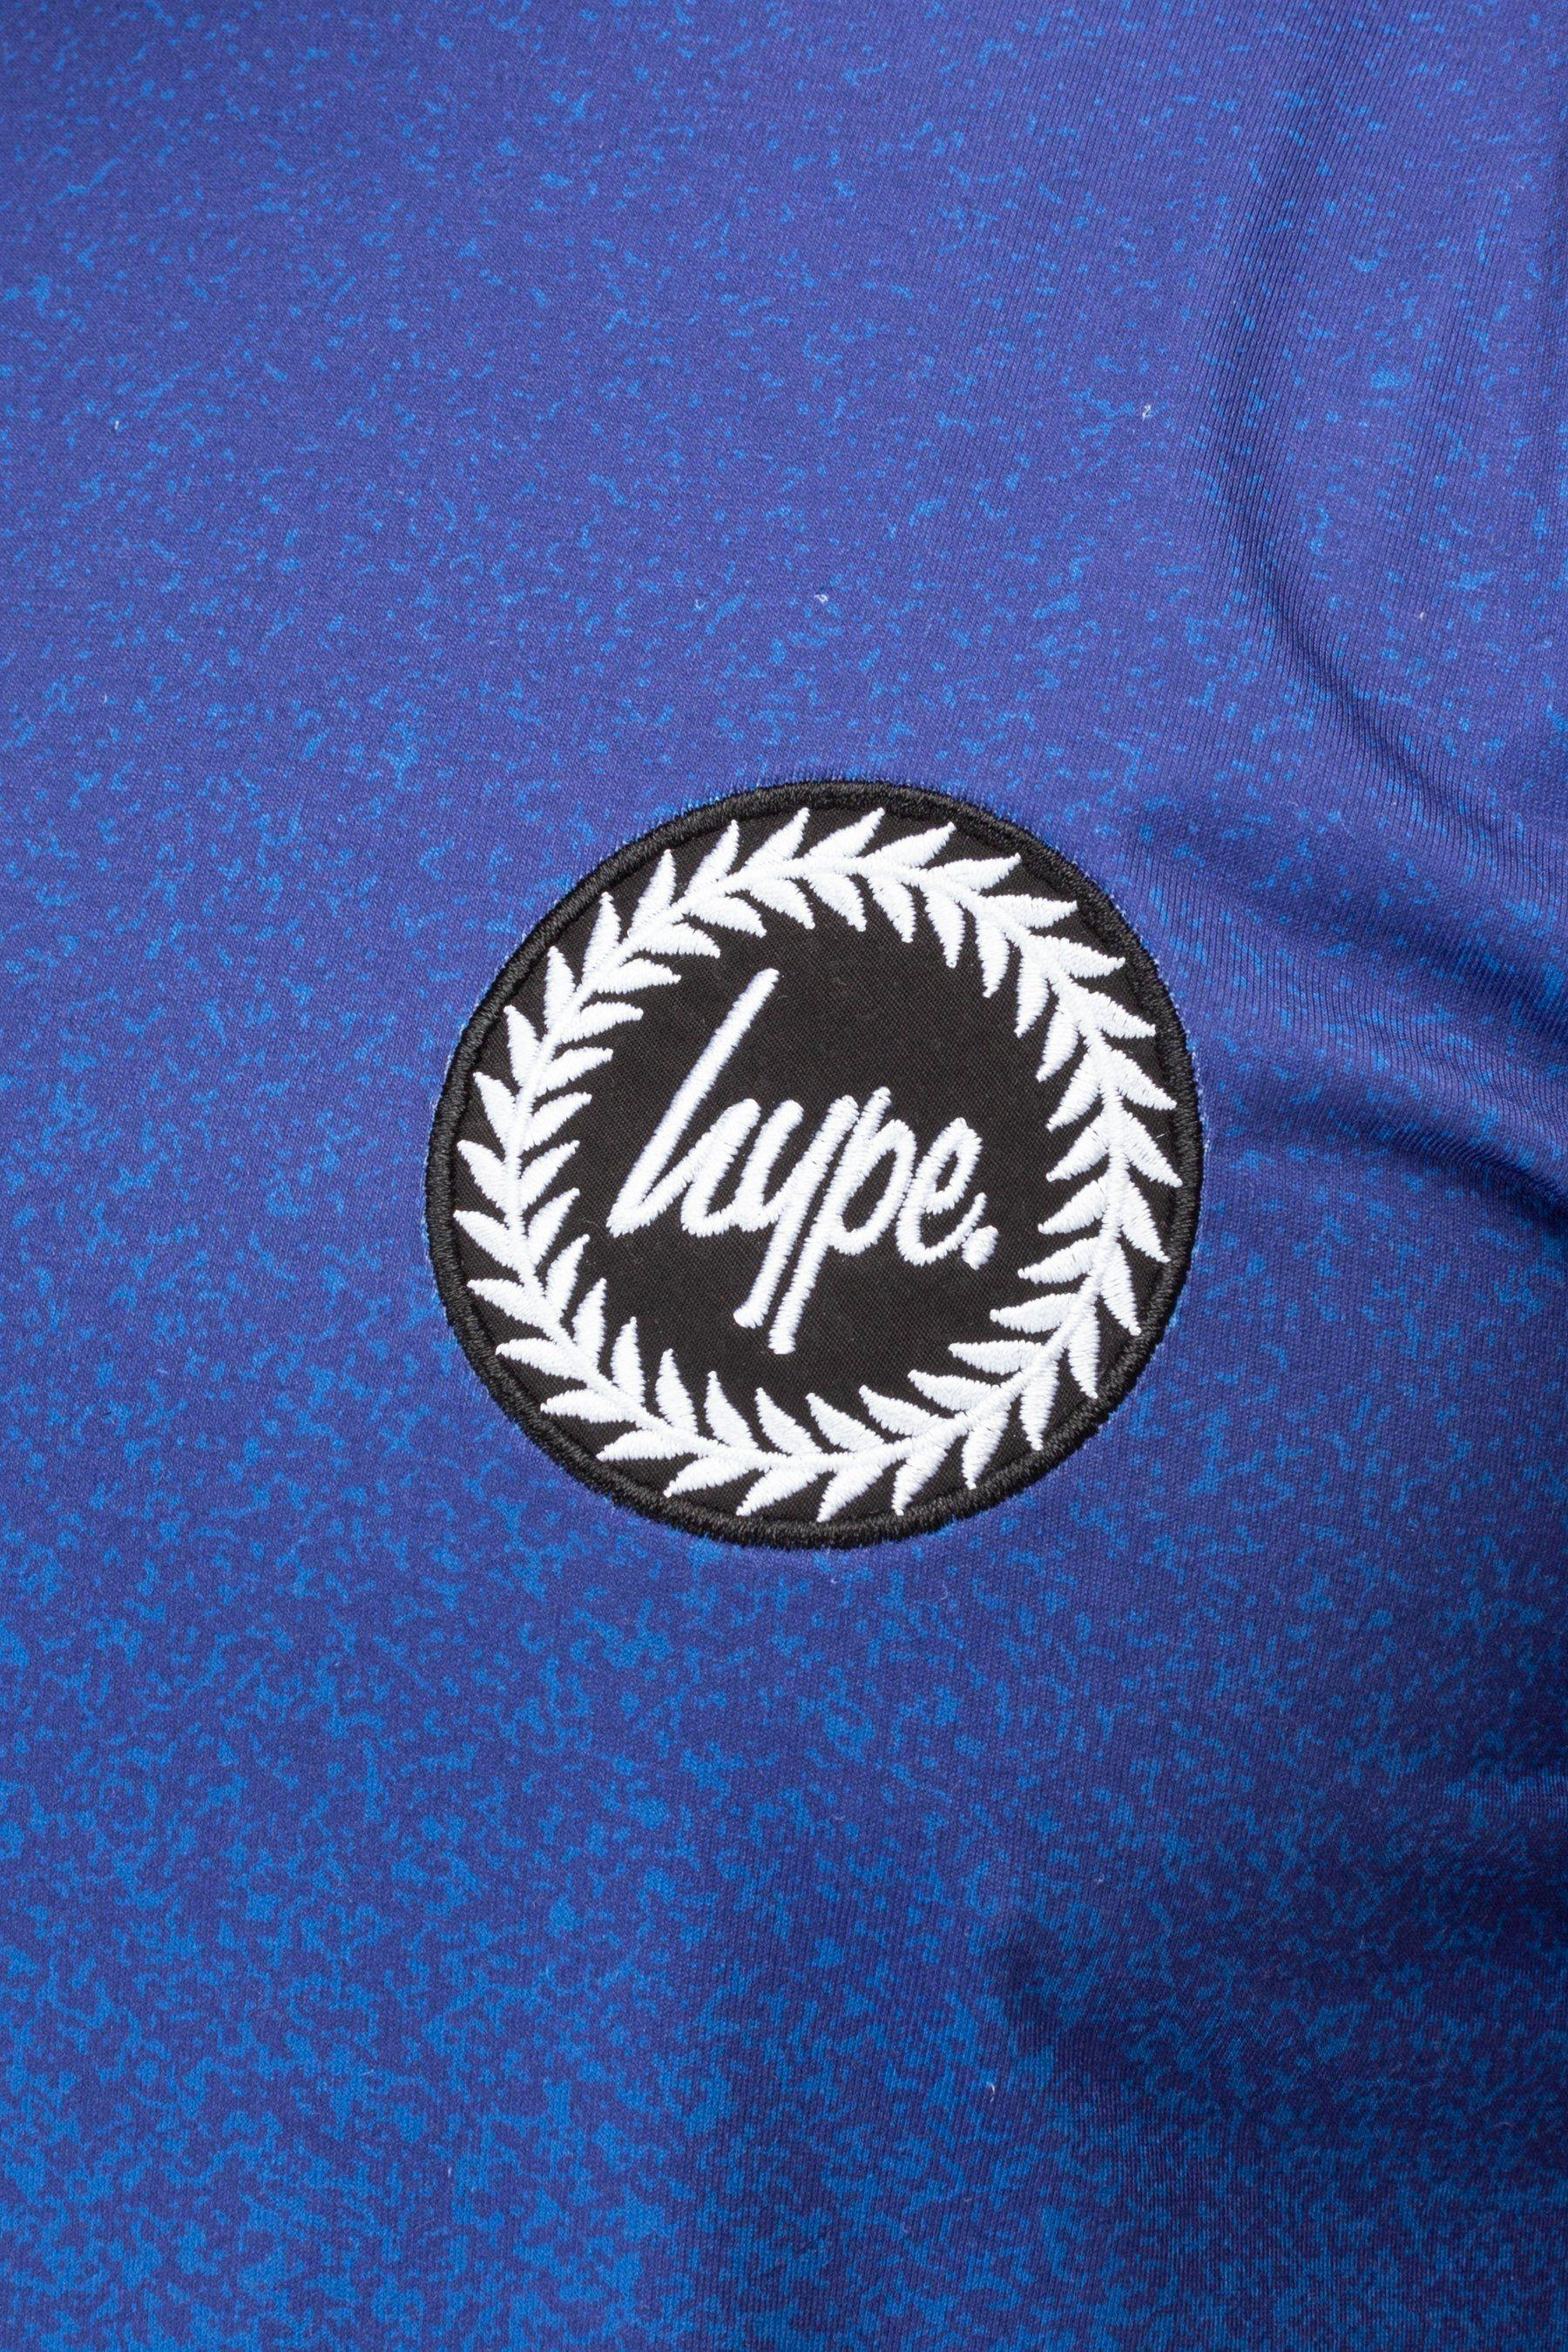 Hype Blue Speckle Fade Crest Mens T-Shirt